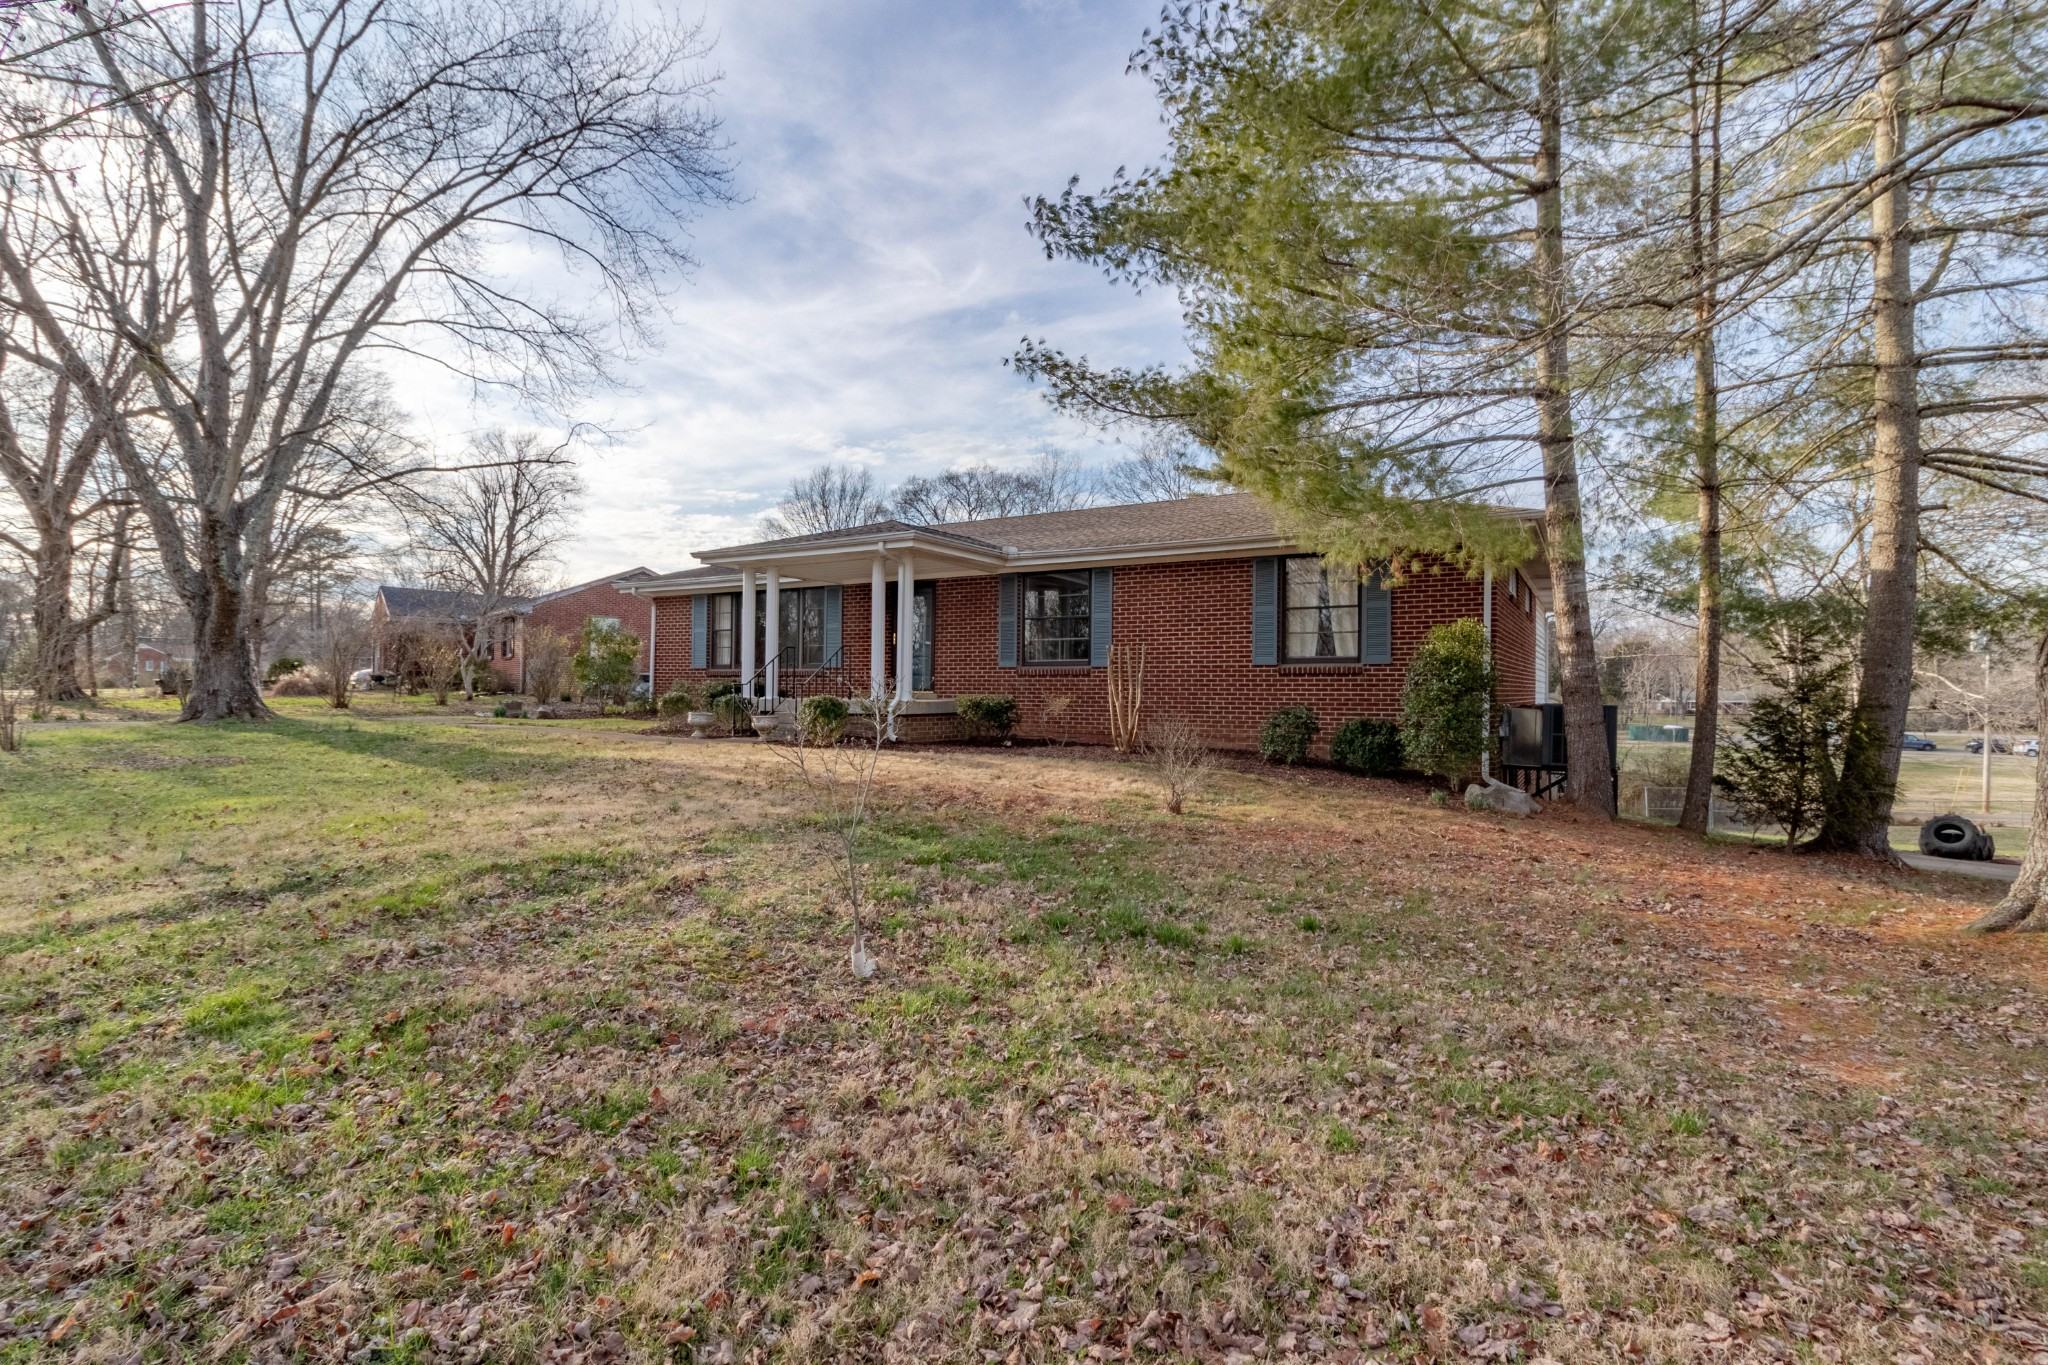 19 Lacy Ln, Clarksville, TN 37043 - Clarksville, TN real estate listing